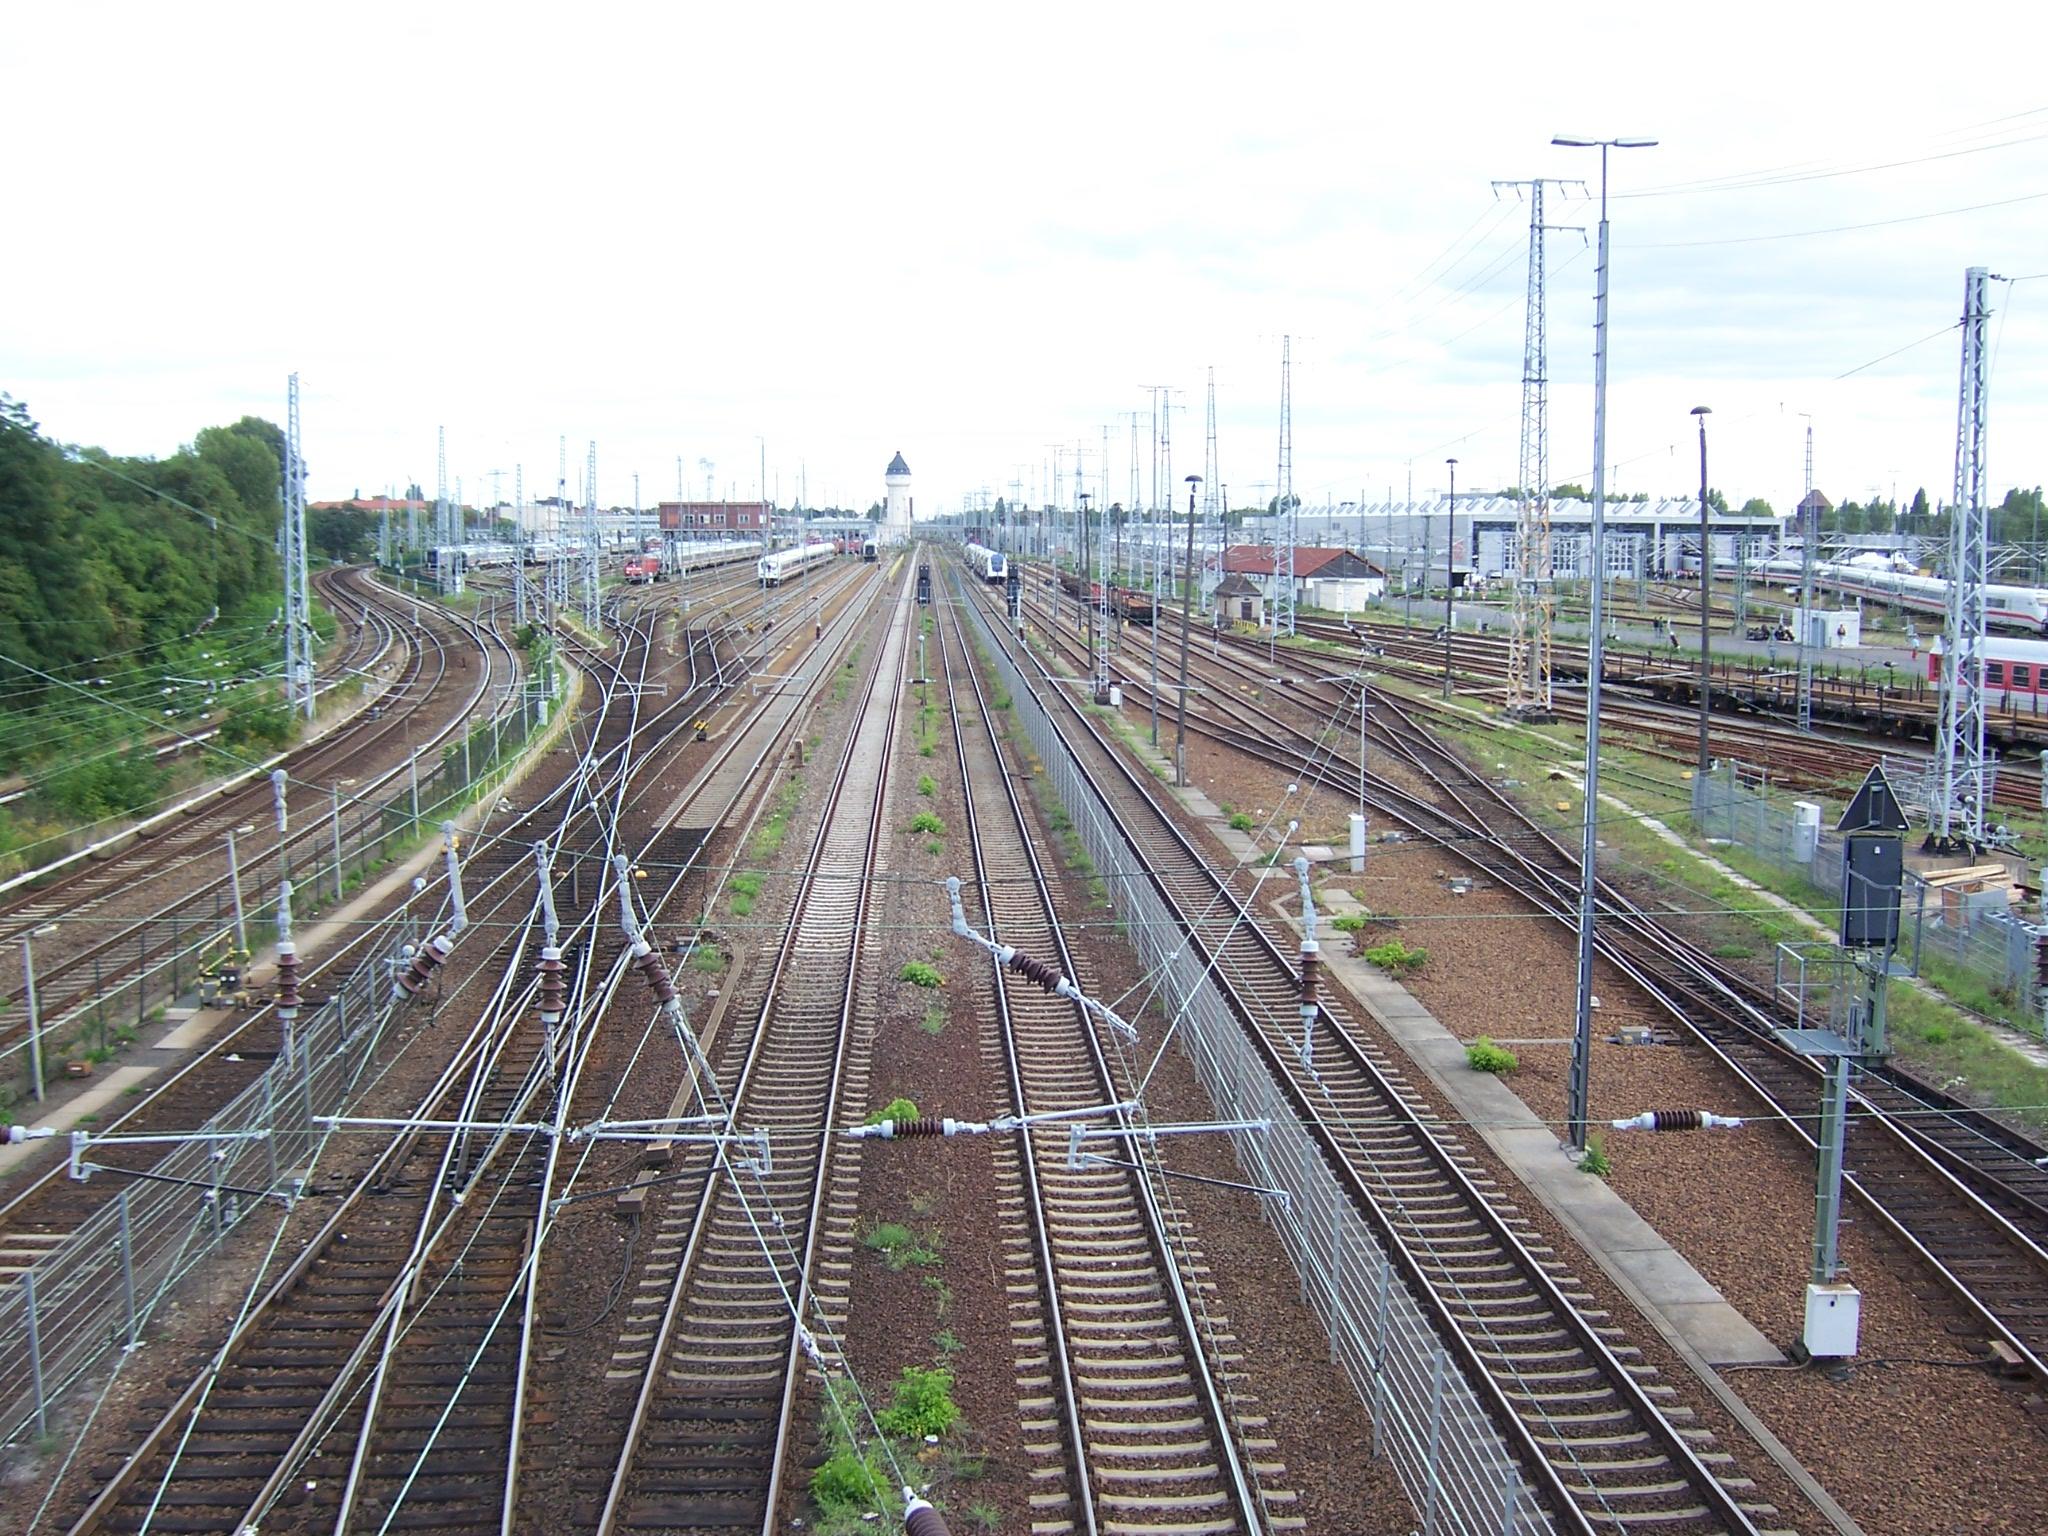 Bahnhof Berlin Rummelsburg Betriebsbahnhof Wikiwand